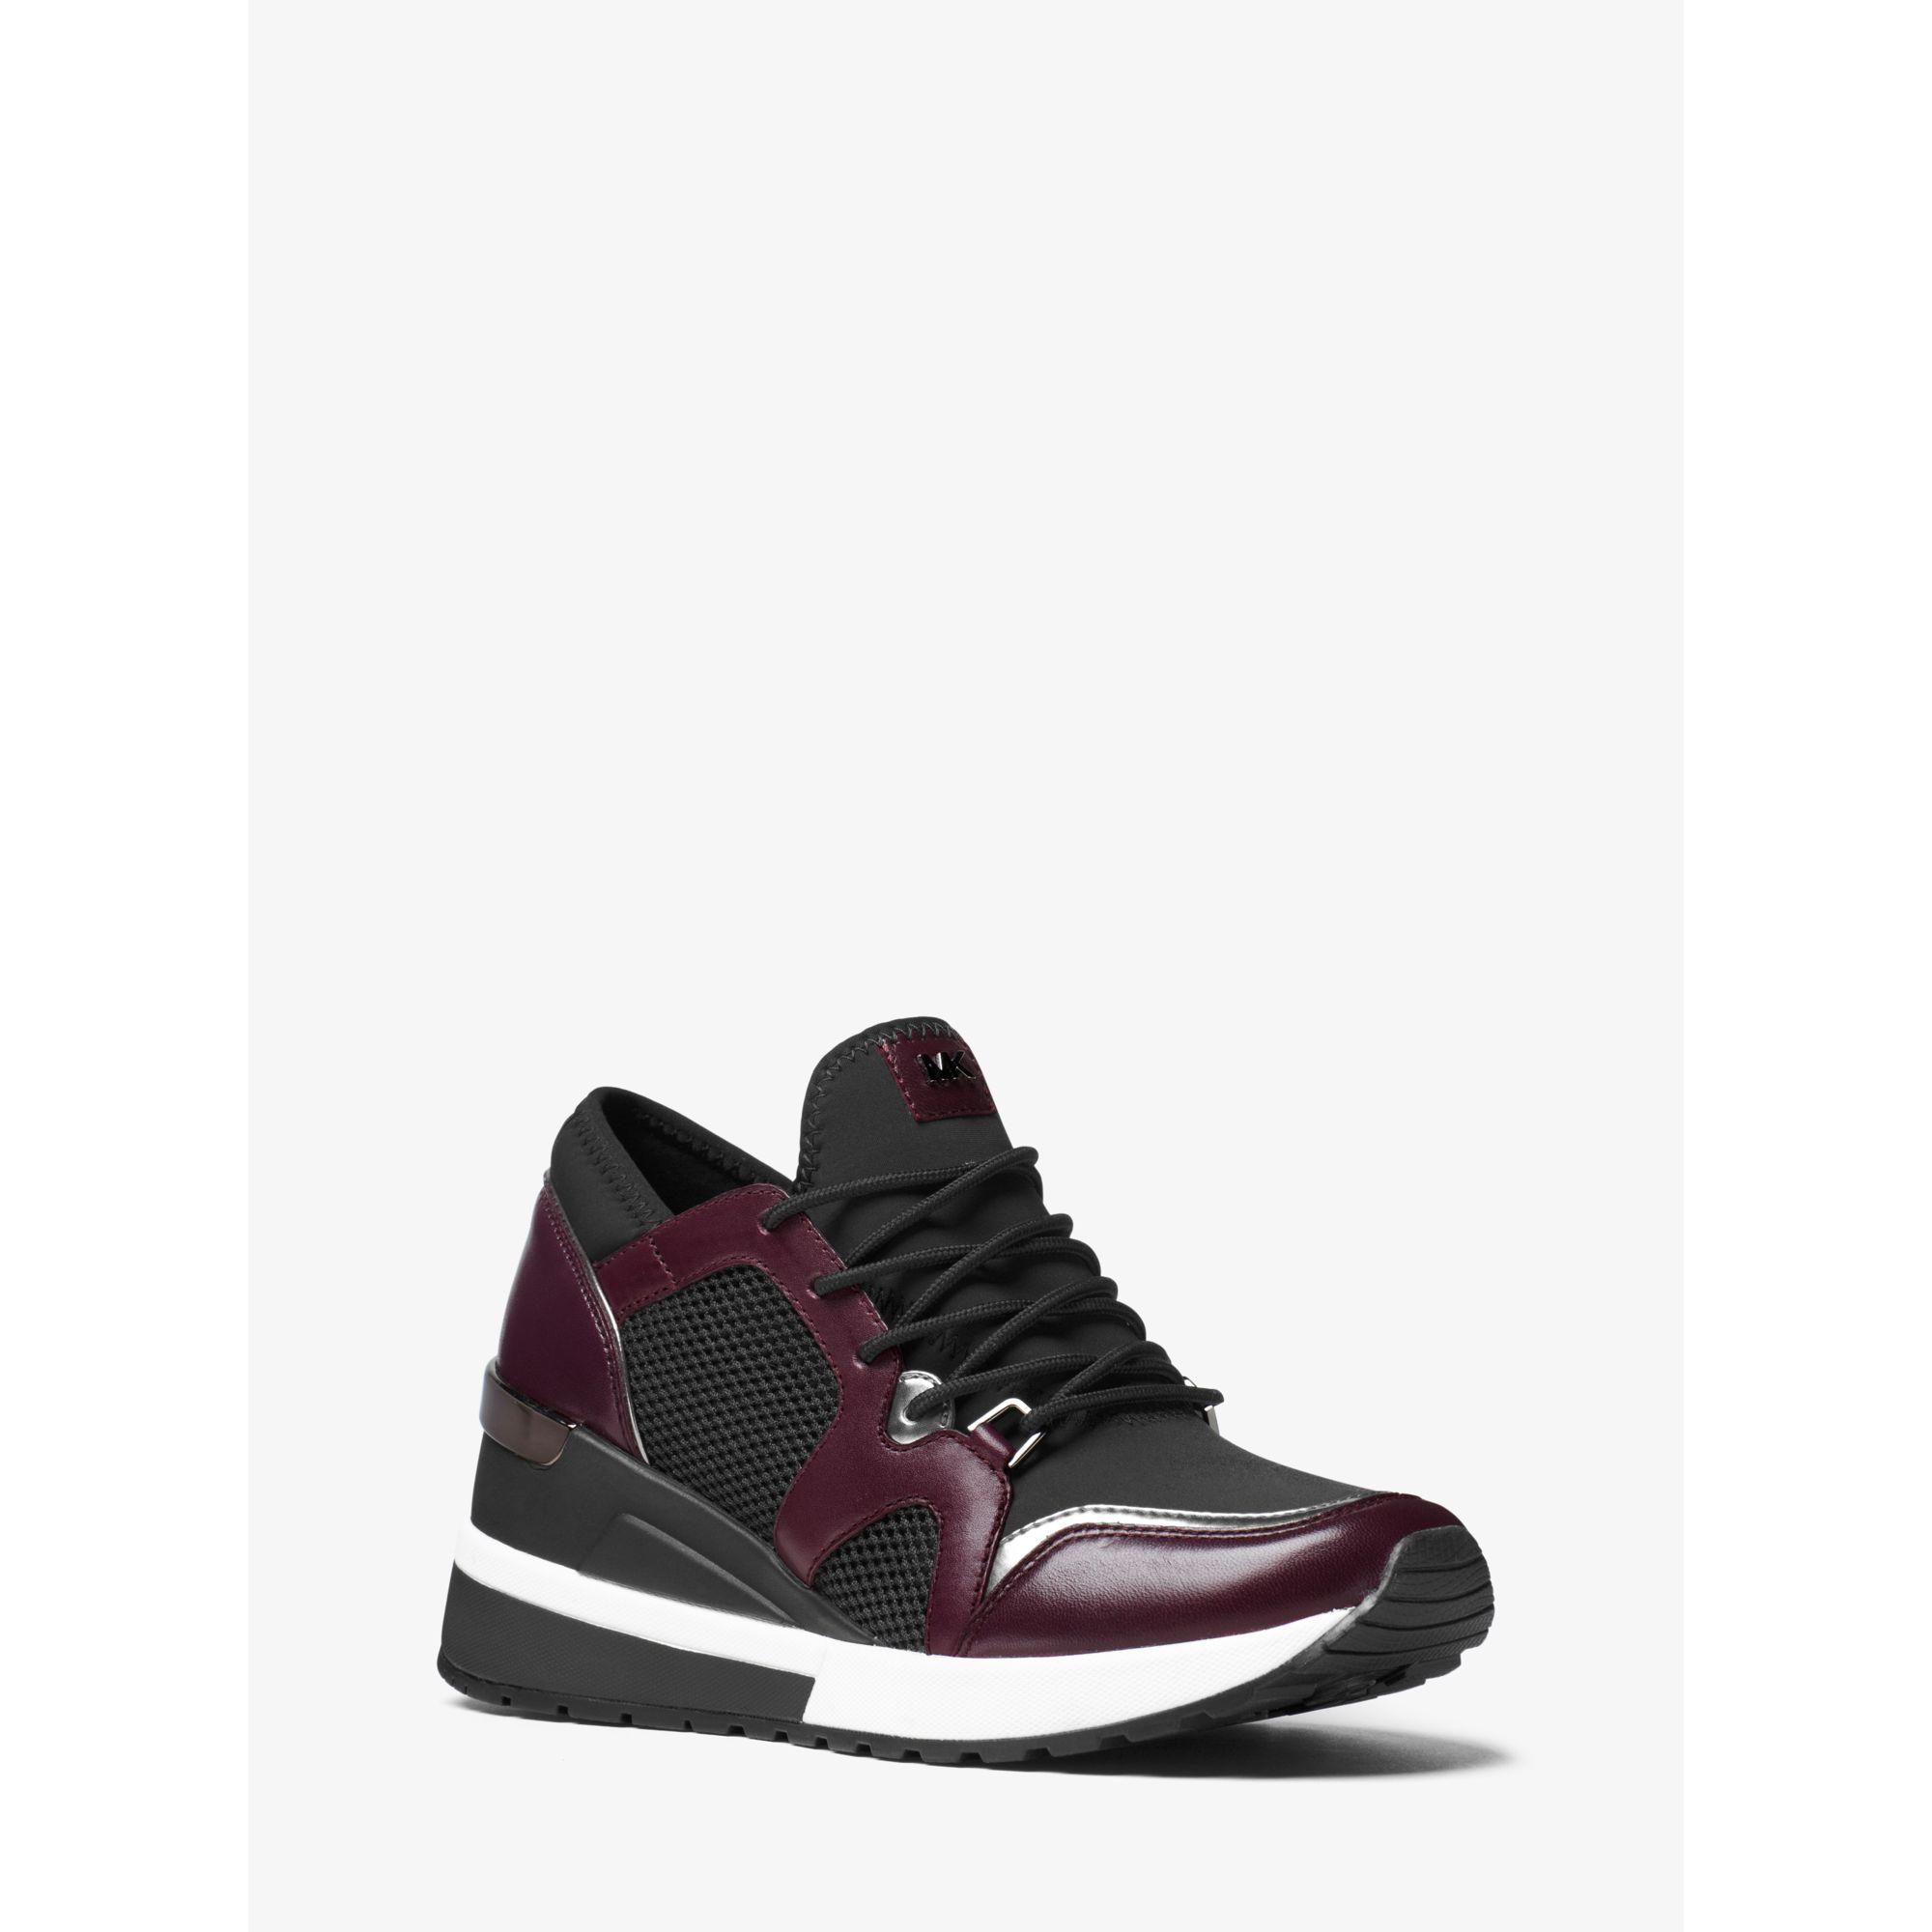 michael kors scout leather trim sneaker in black lyst. Black Bedroom Furniture Sets. Home Design Ideas